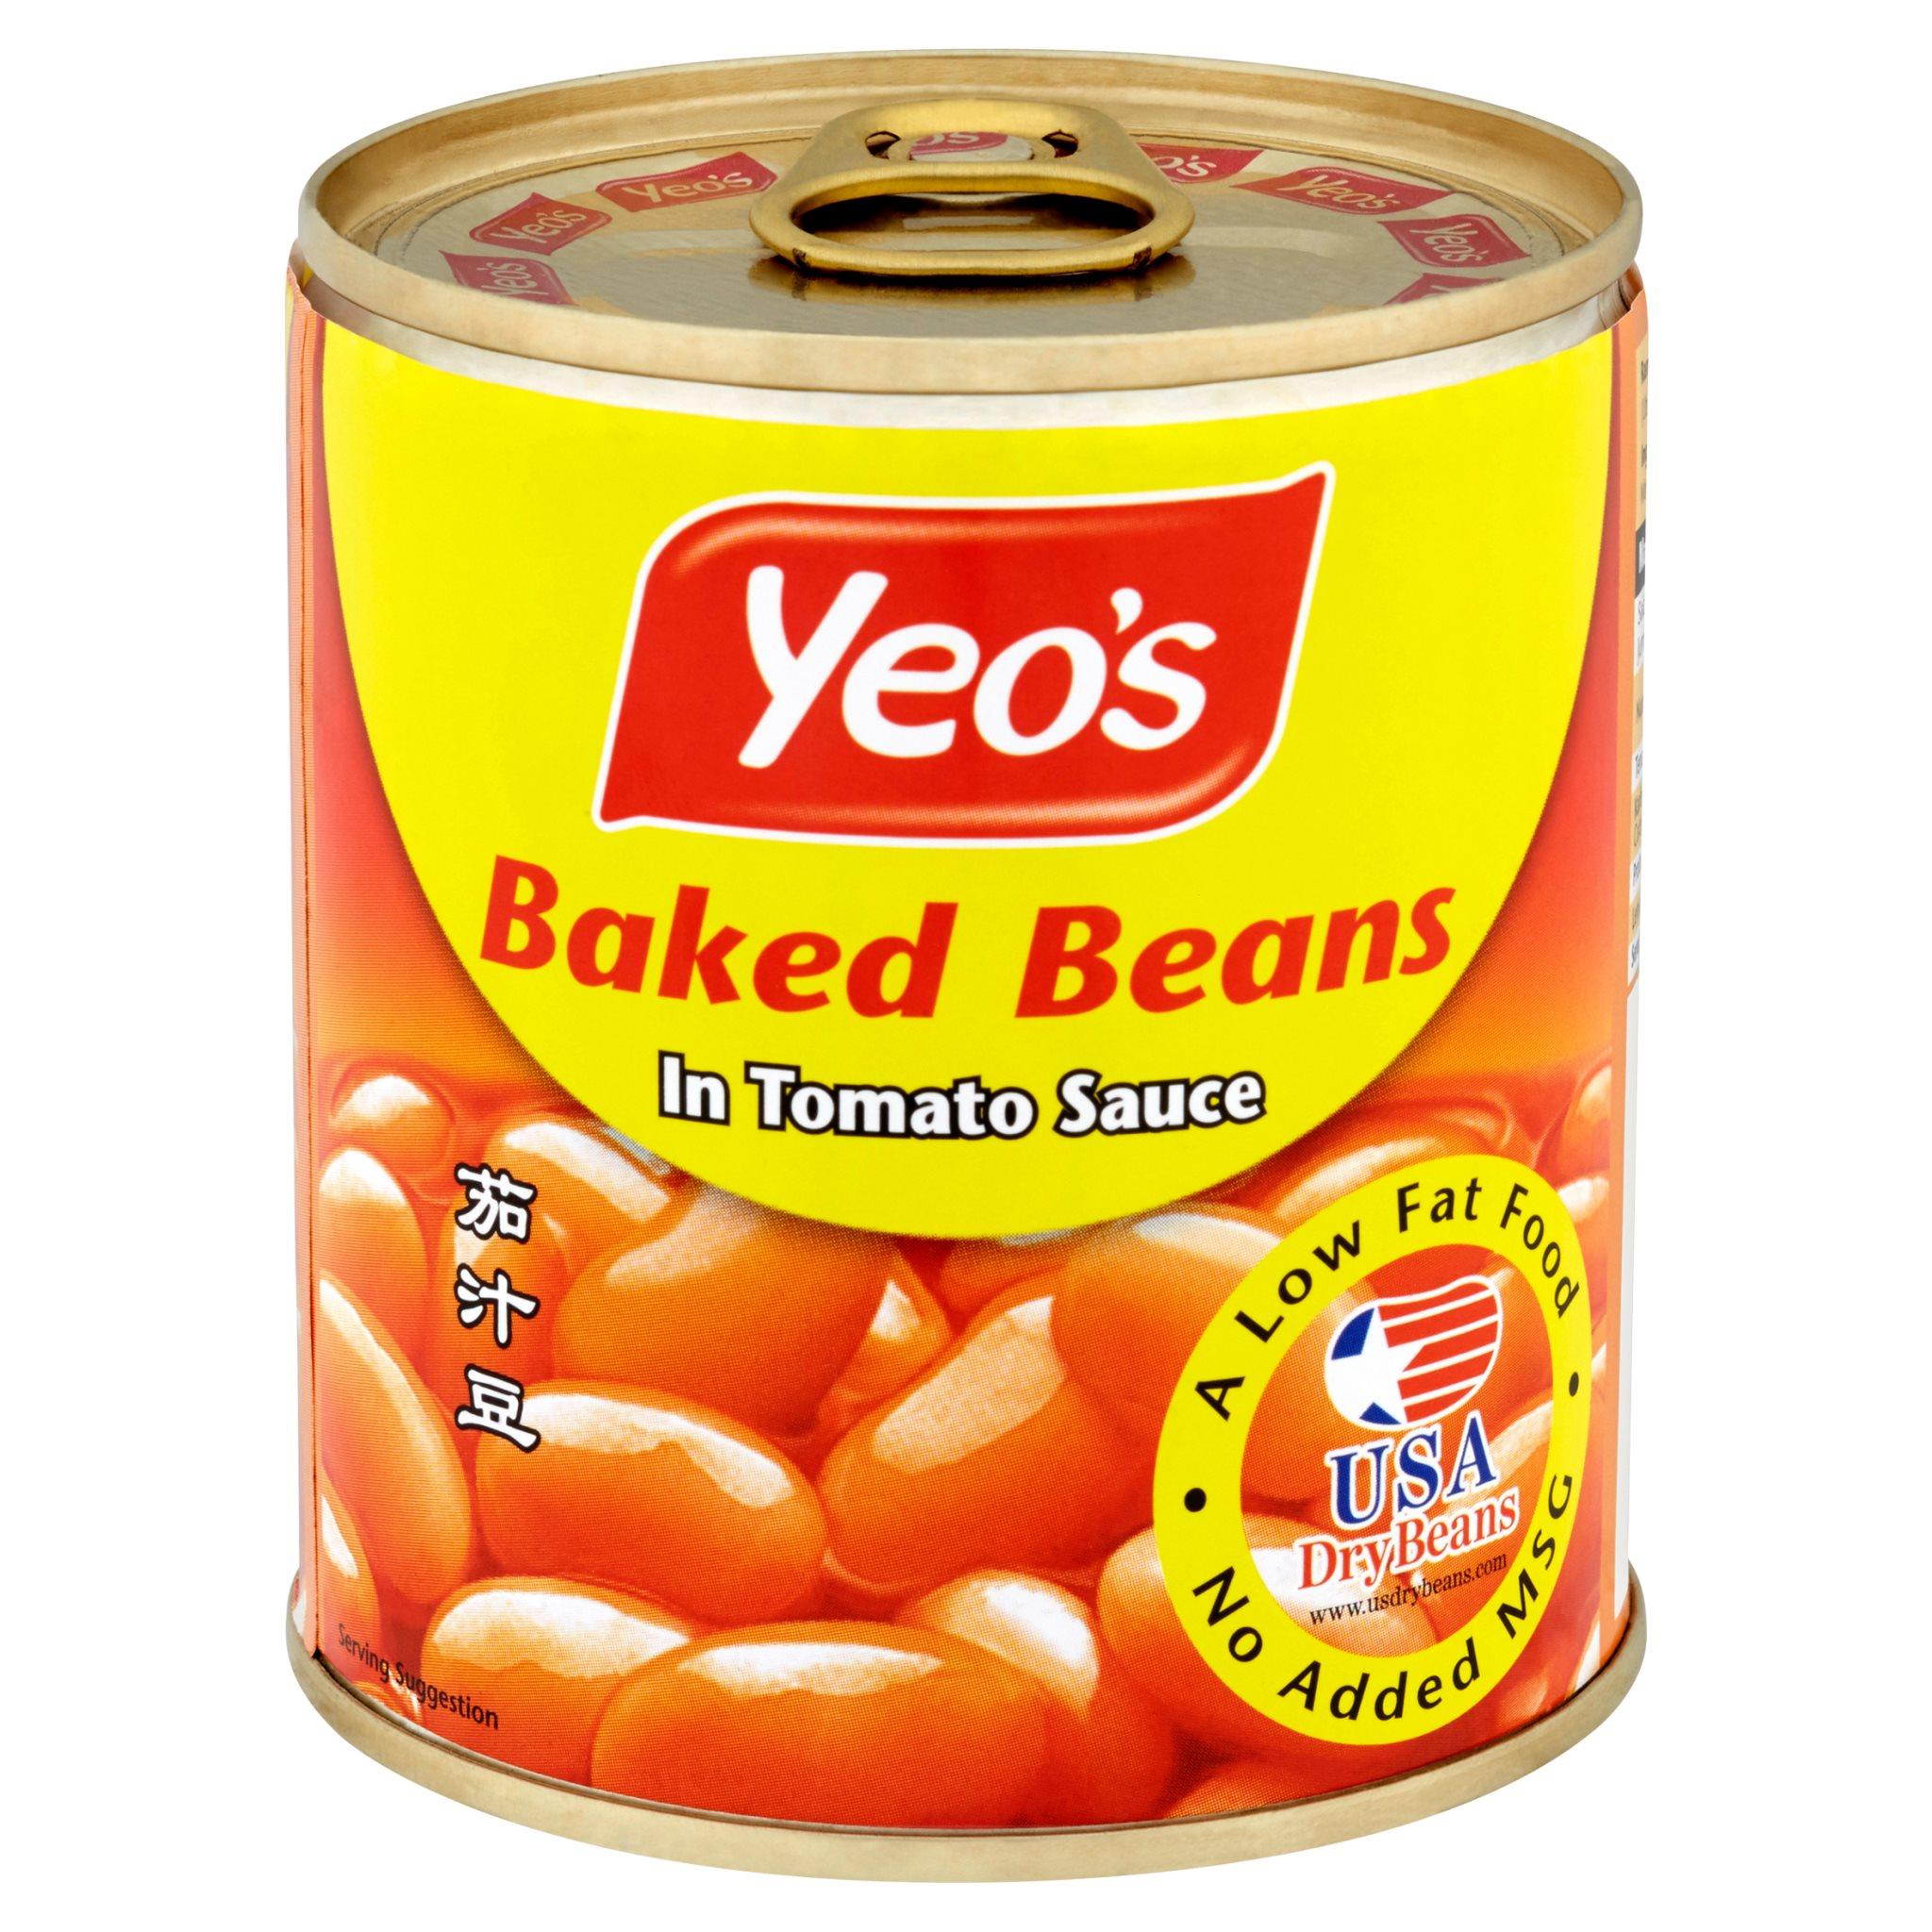 Yeo's Baked Bean (300g)